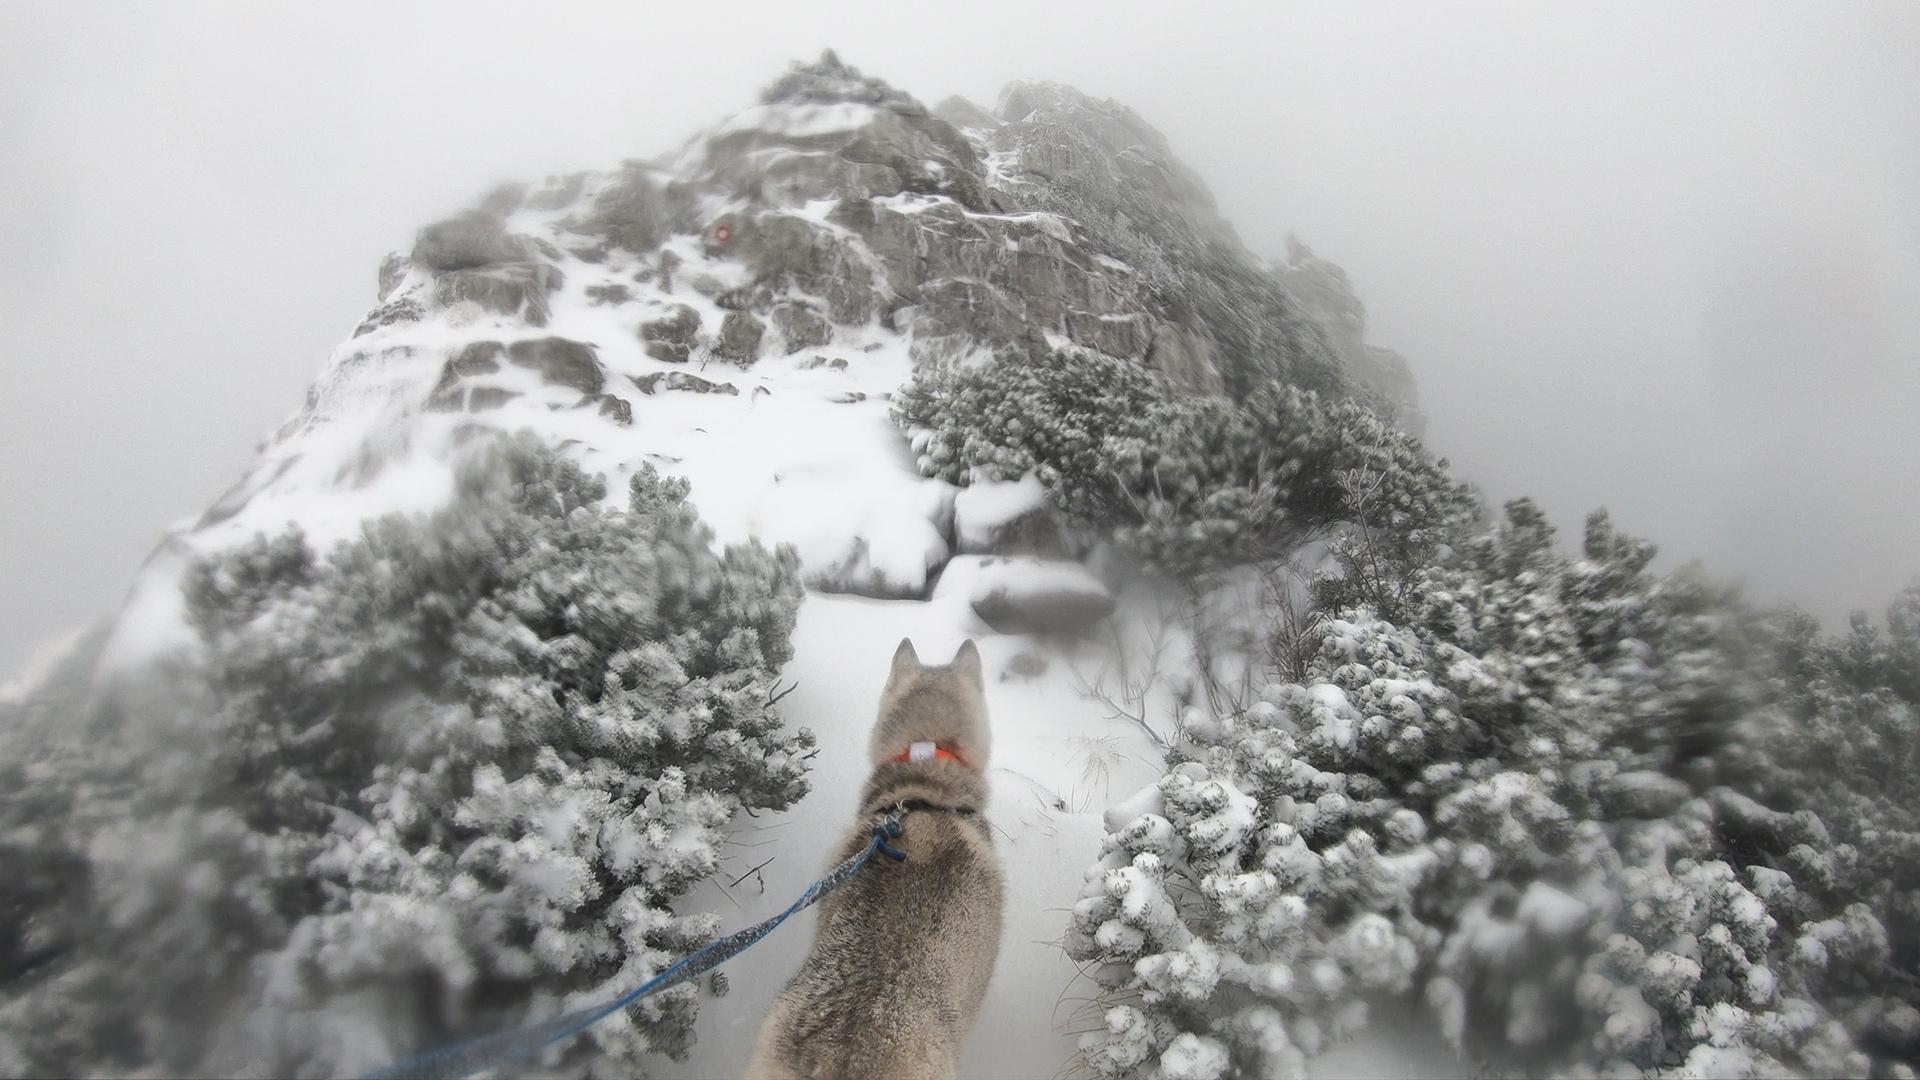 Risnjak Winter Peak Croatia Hiking.jpg (1.13 MB)